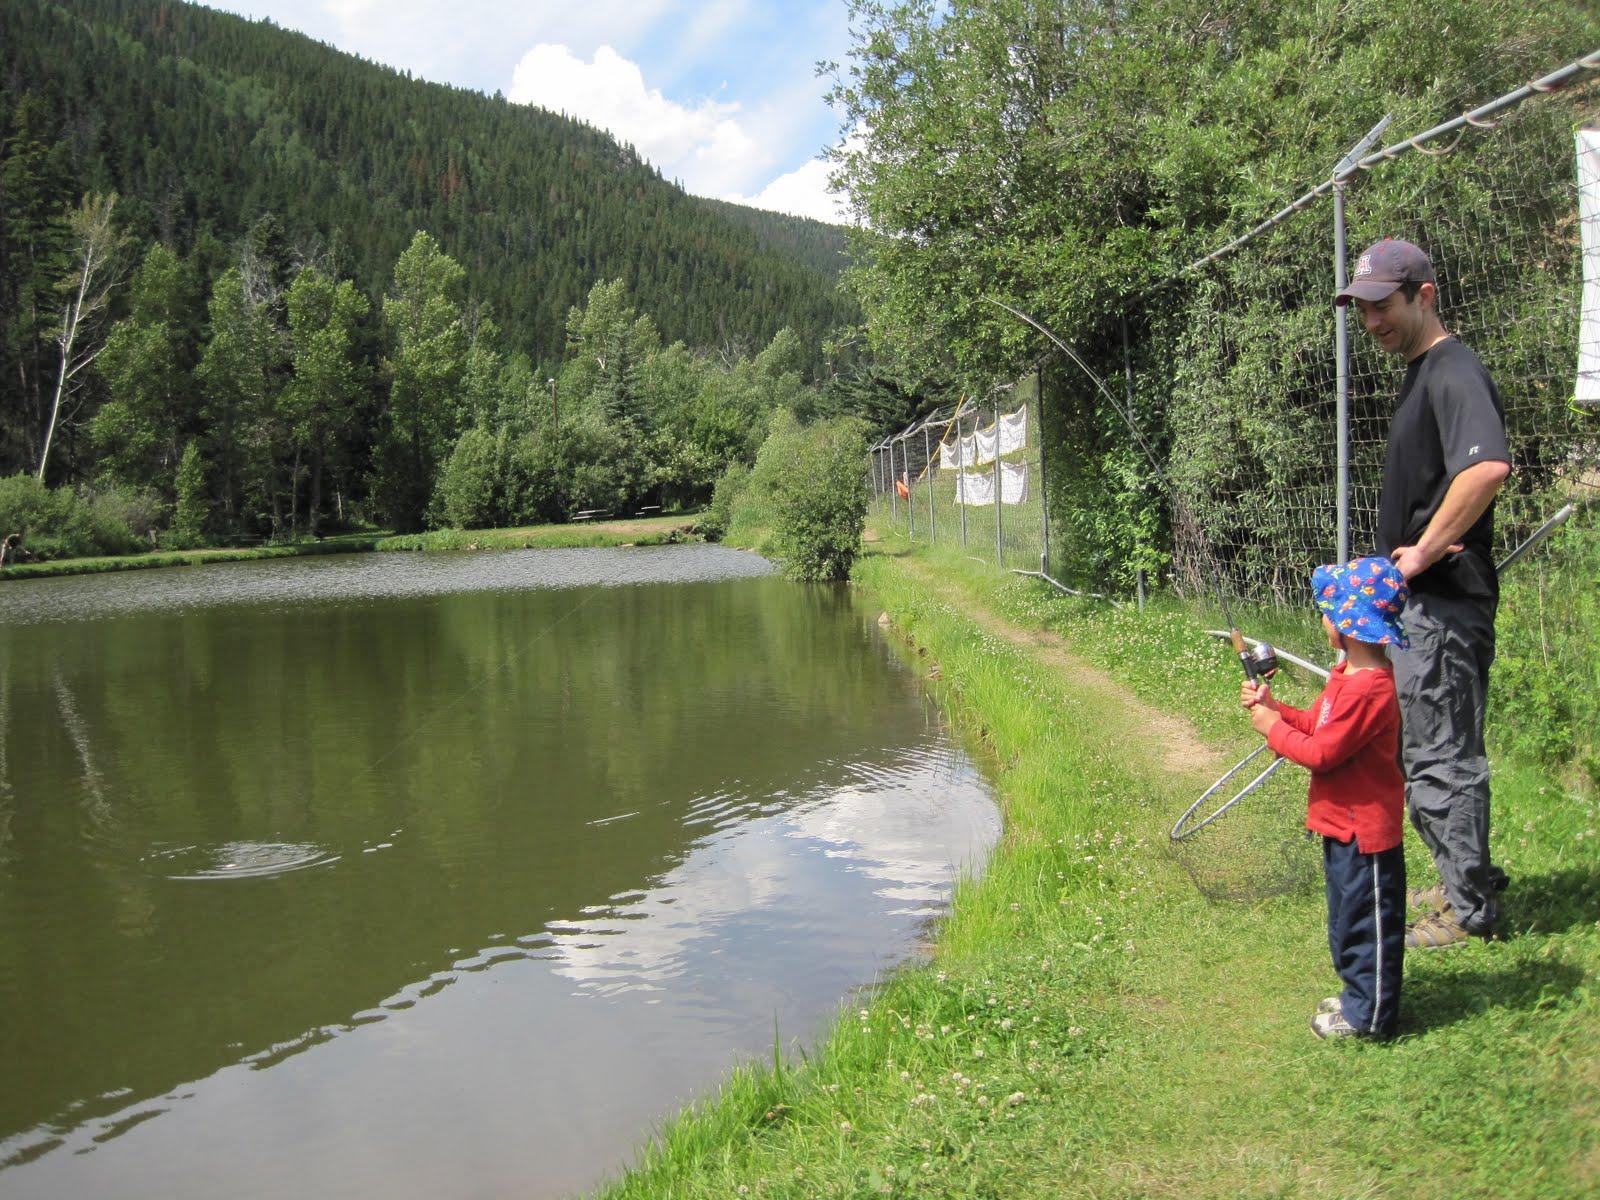 Fun ... Fishing Fish in Gresik Rice Pond